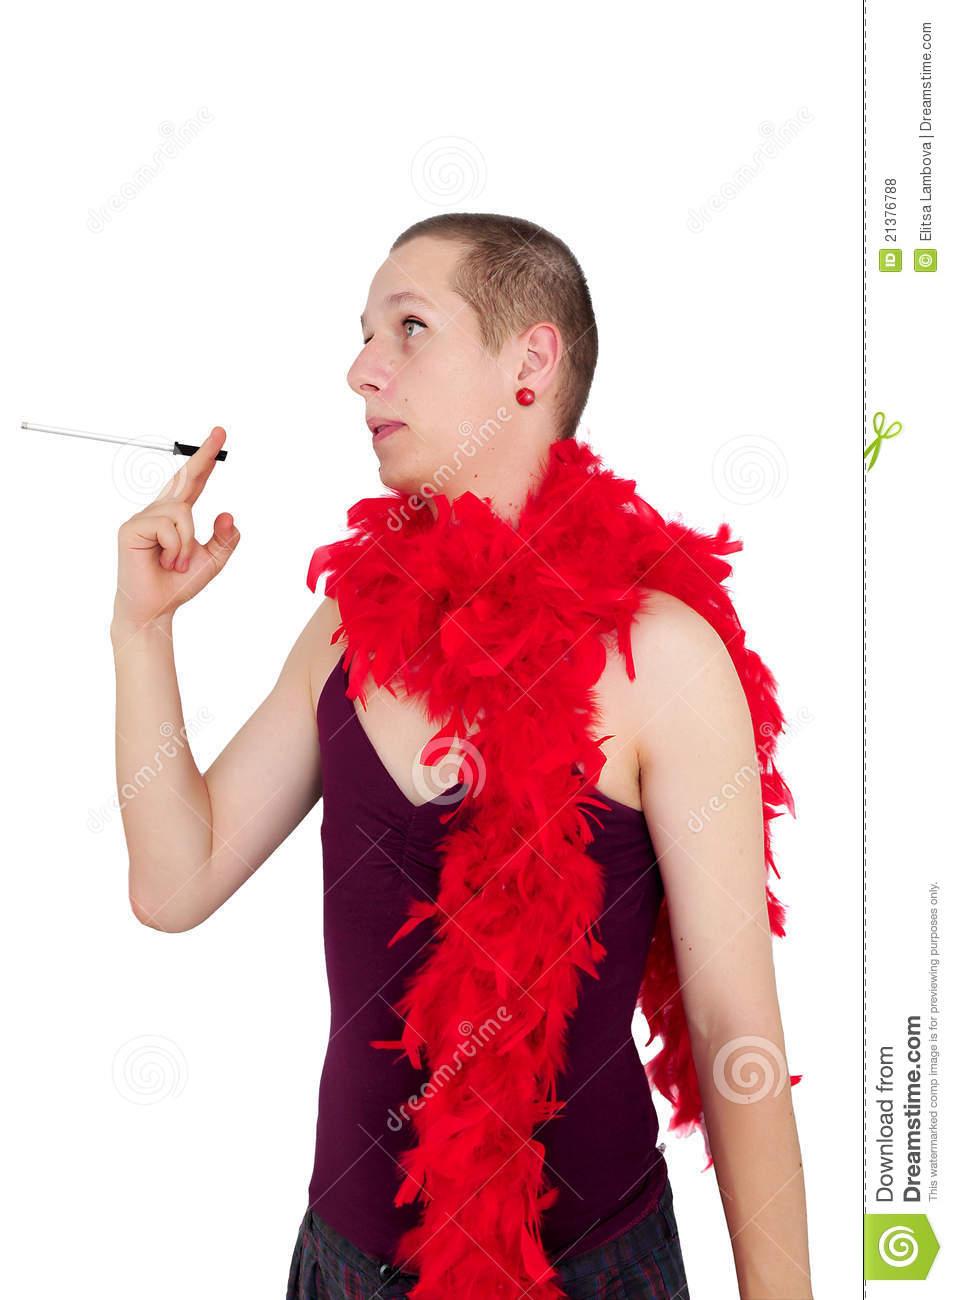 Dress Him Like A Woman - 20 Great Ideas